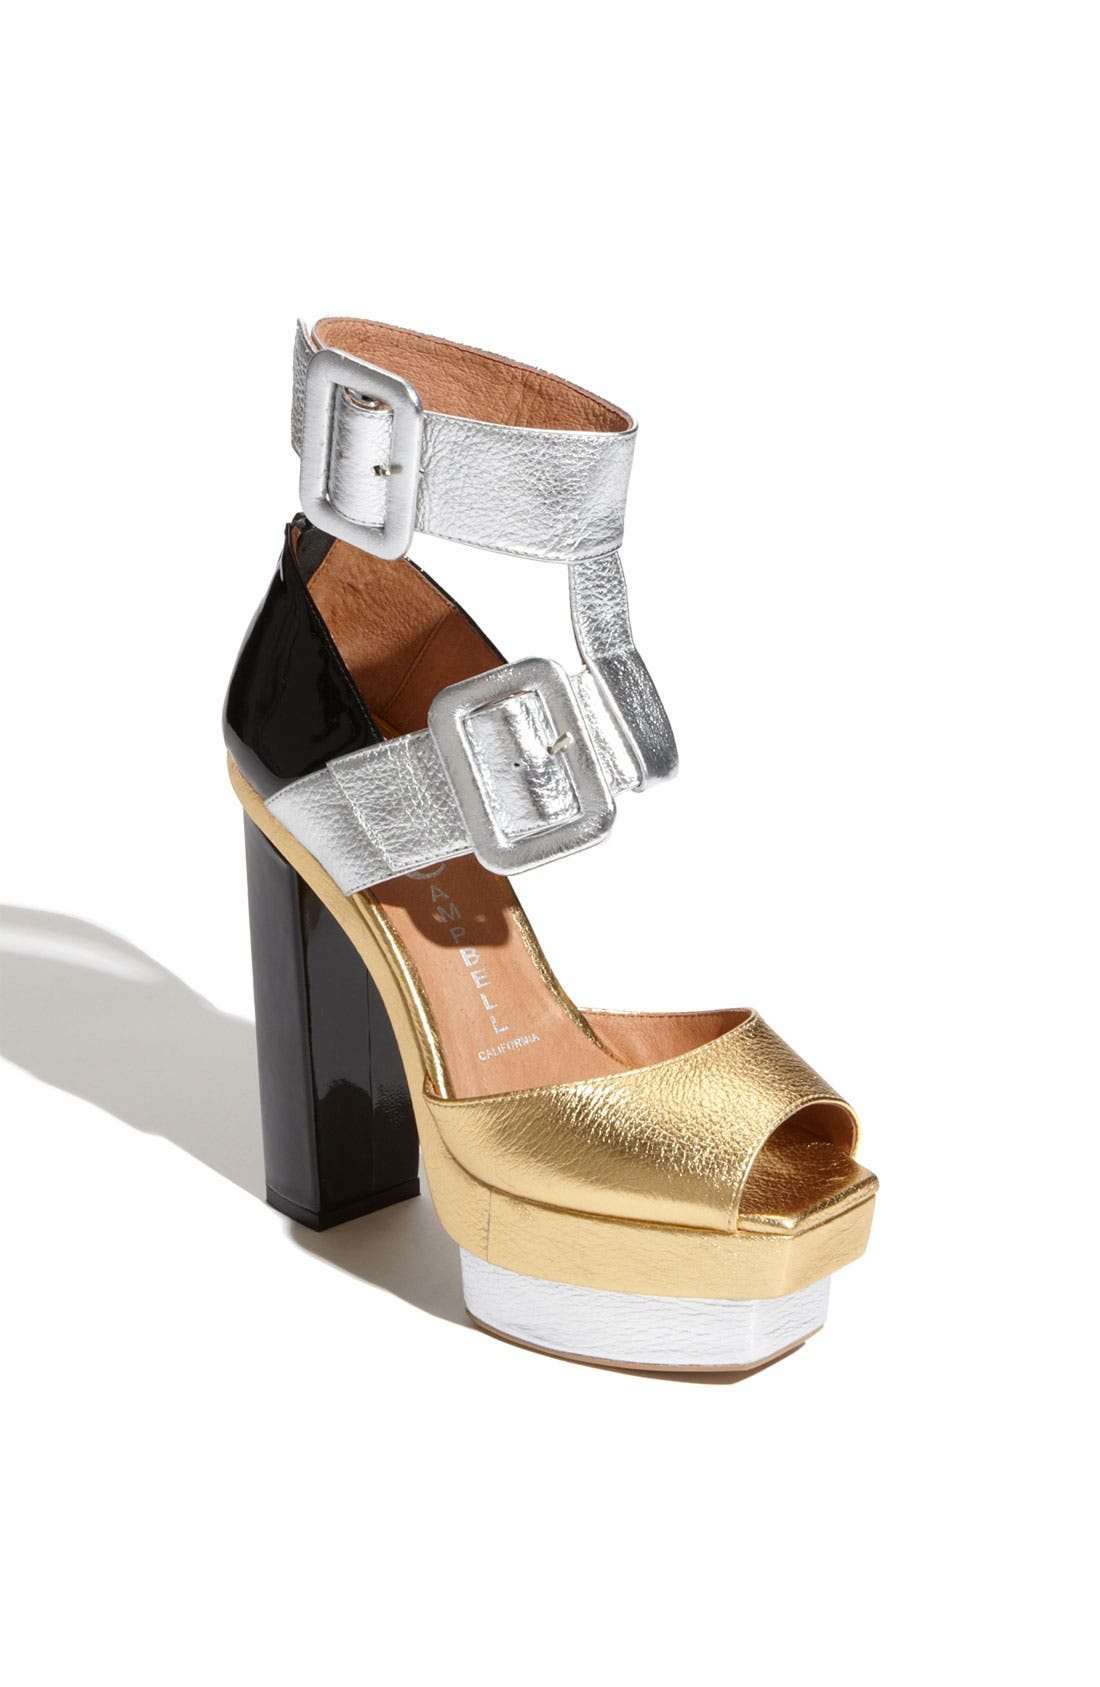 Main Image - Jeffrey Campbell 'Dressen' Sandal